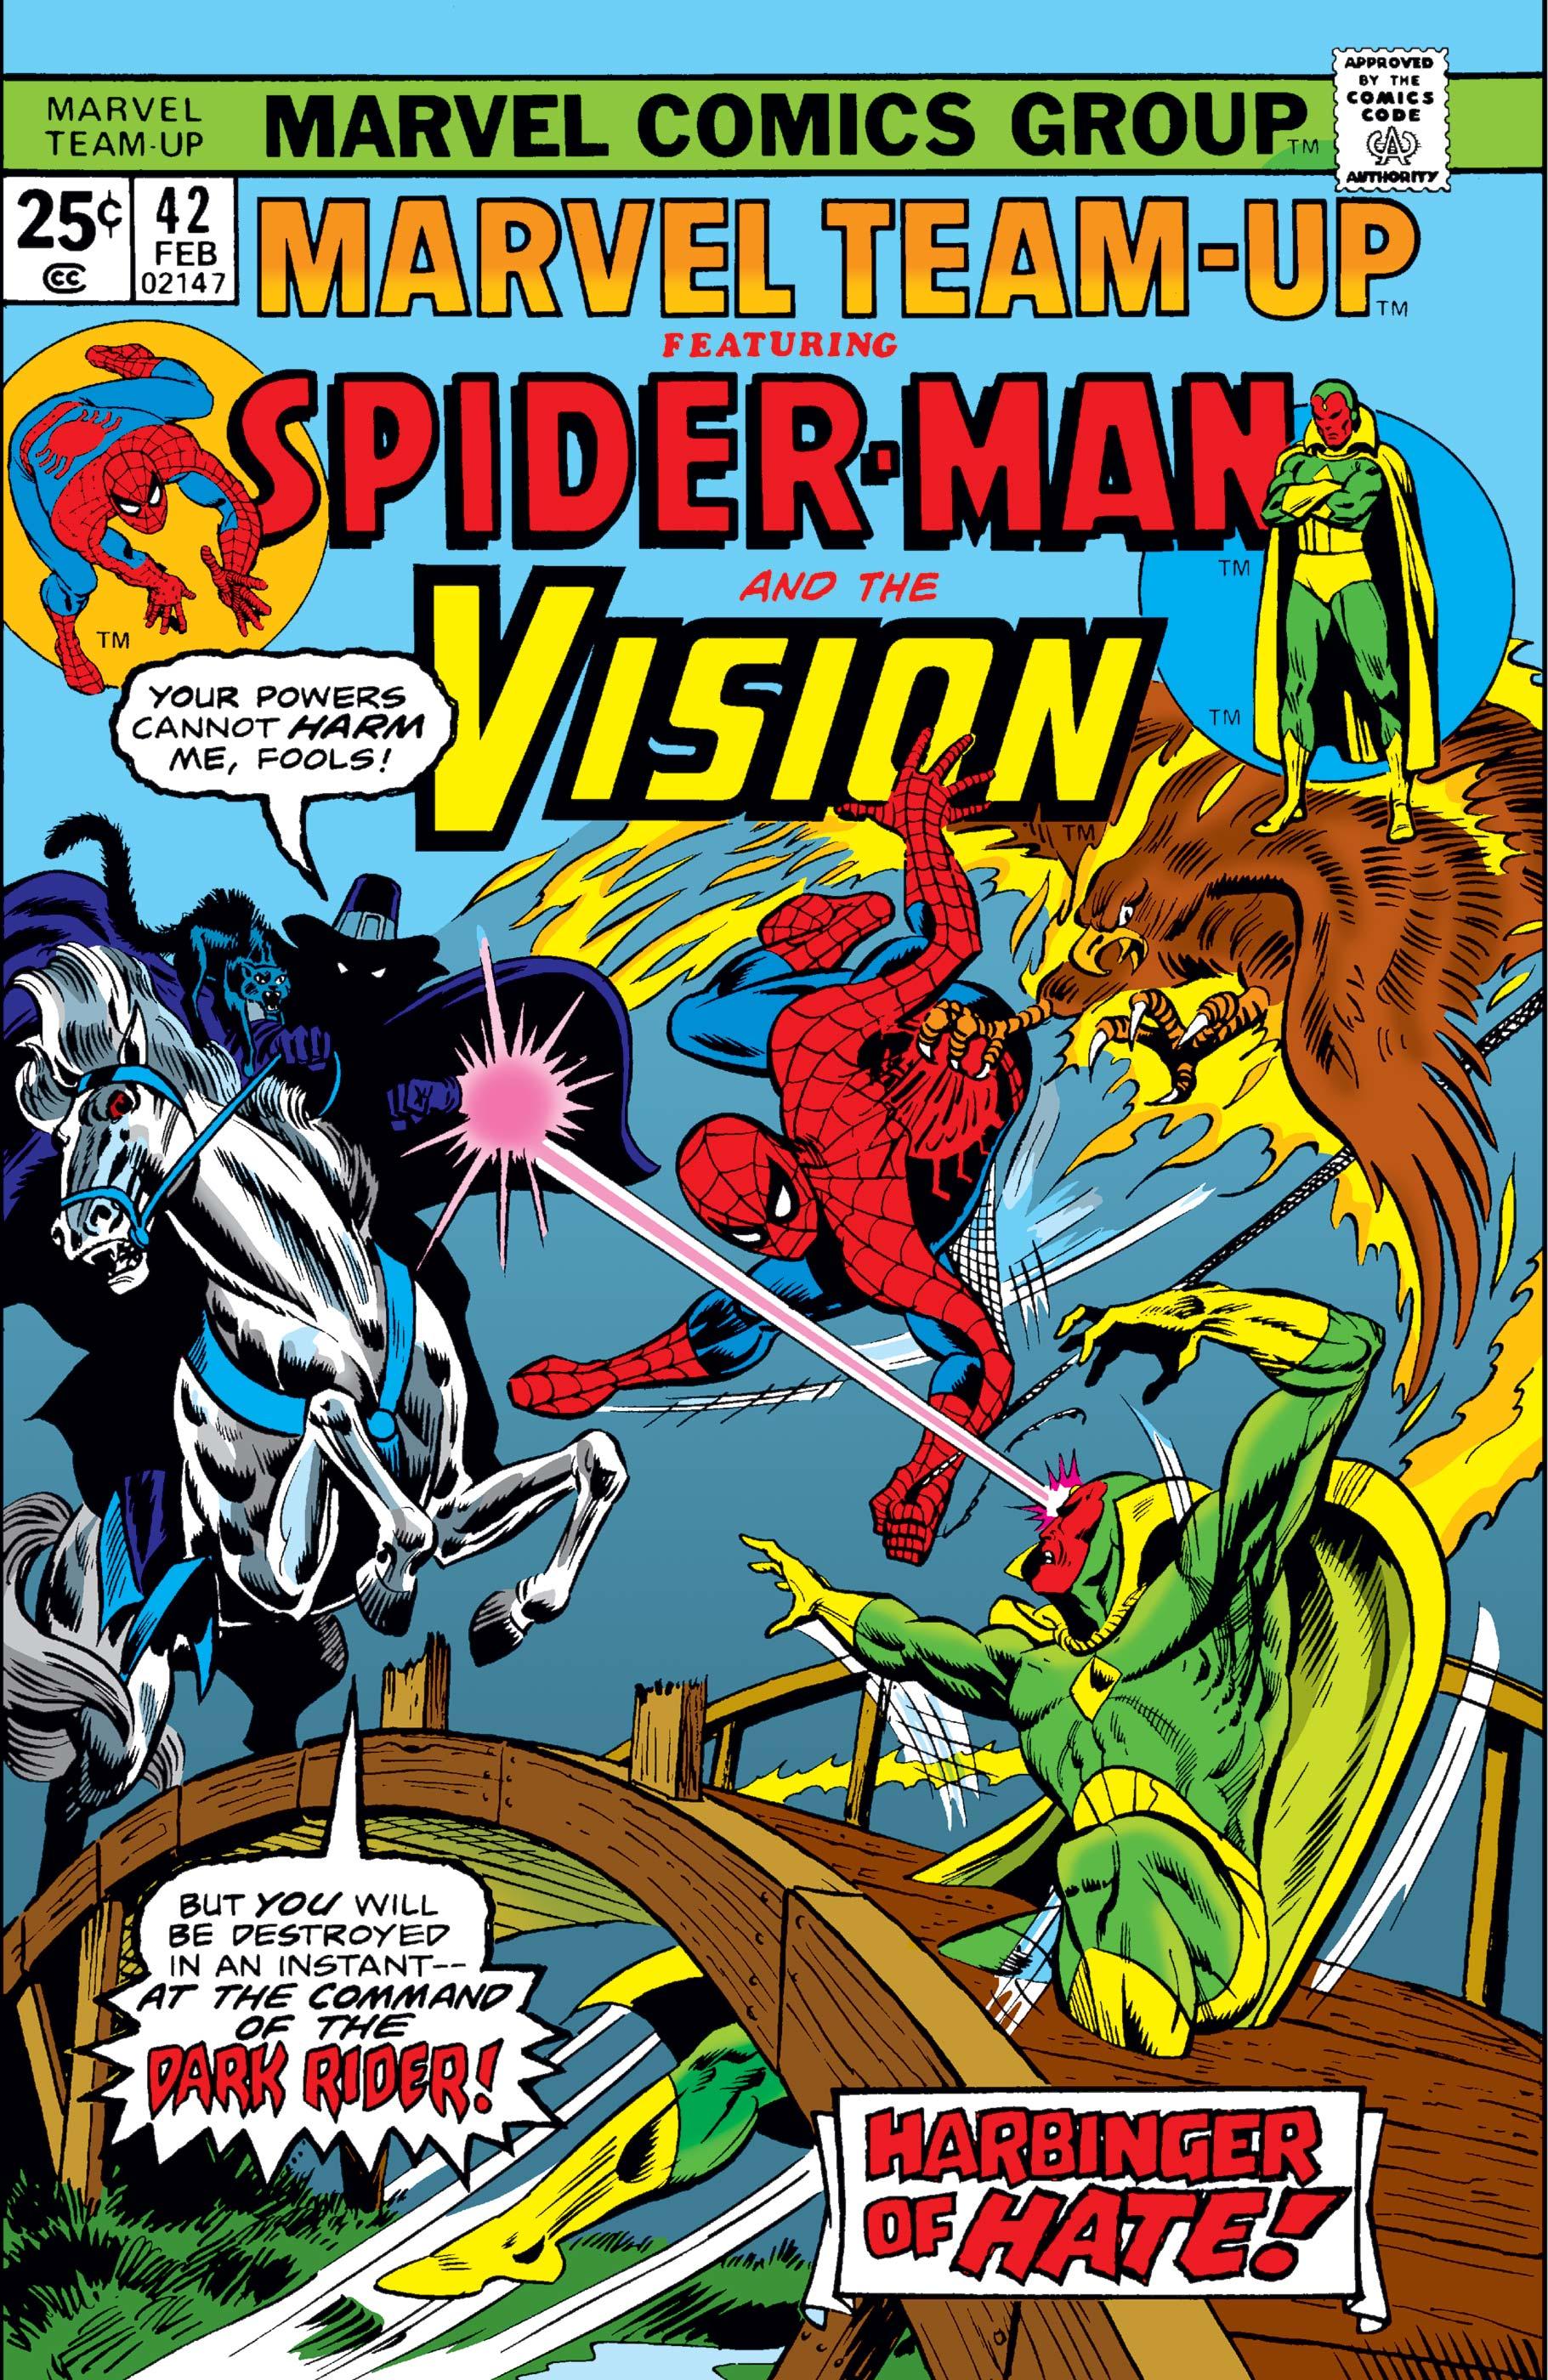 Marvel Team-Up (1972) #42